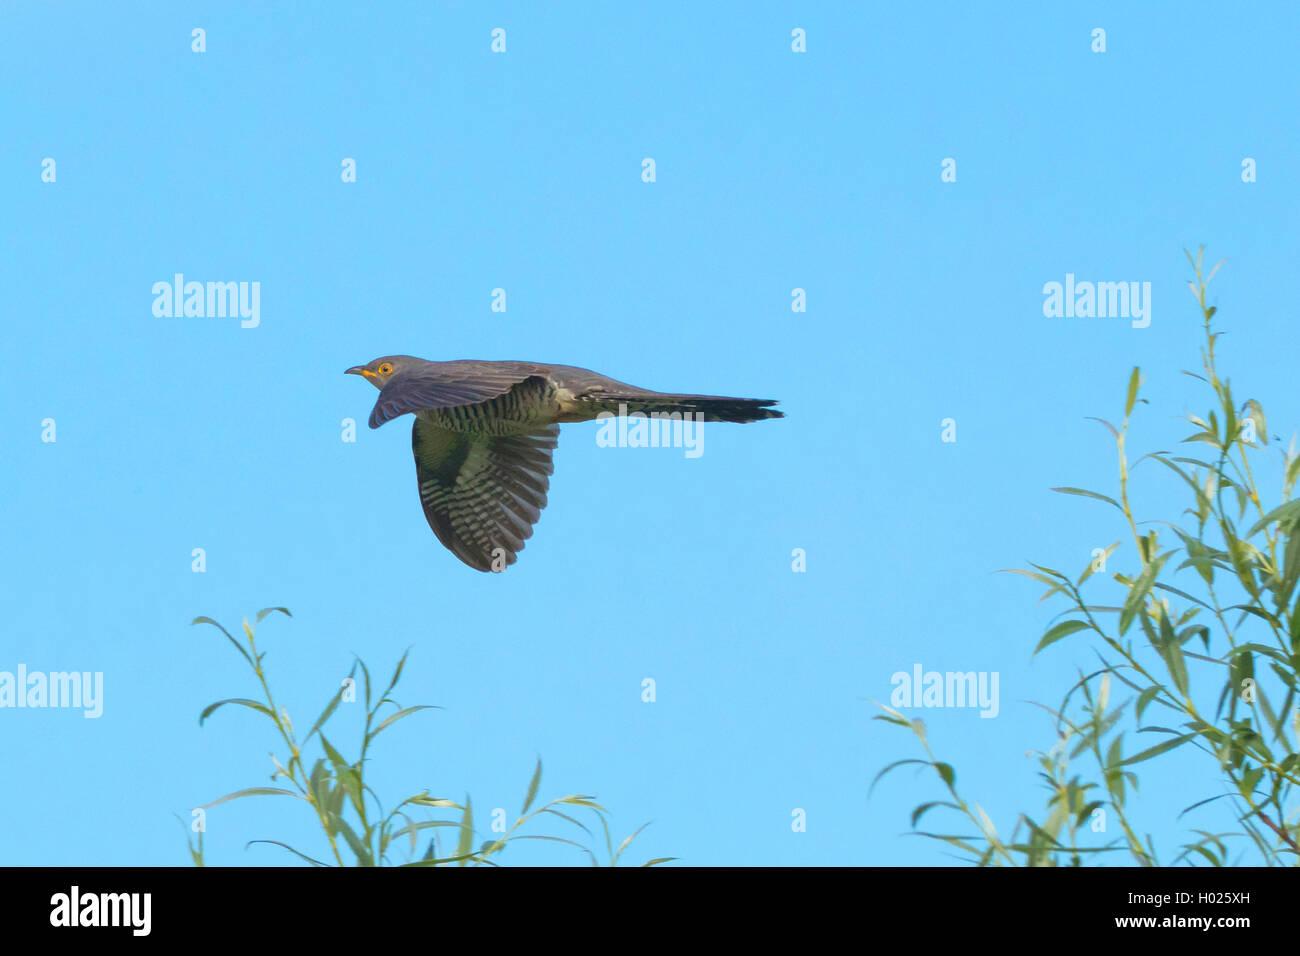 Kuckuck (Cuculus canorus), fliegend, Deutschland, Bayern | Eurasian cuckoo (Cuculus canorus), flying, Germany, Bavaria - Stock Image